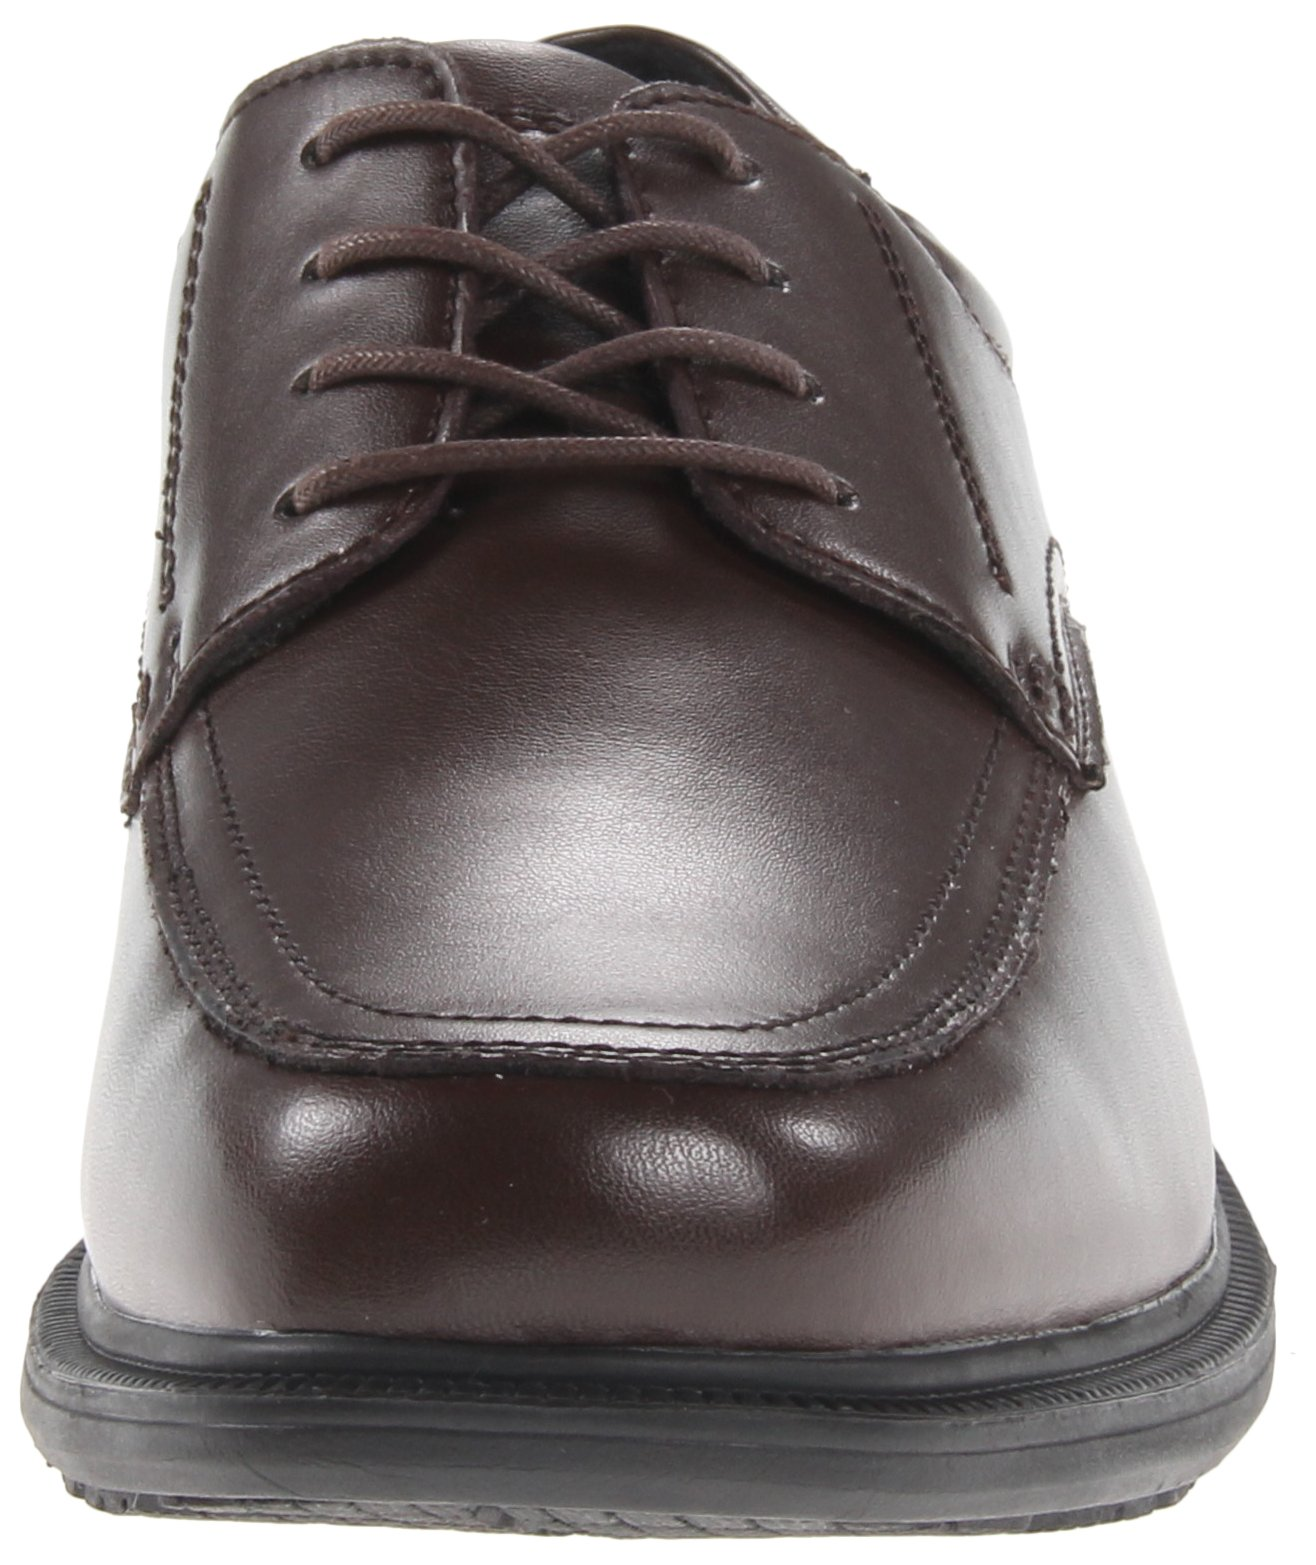 Nunn Bush Men's Bourbon Street Moccasin Toe Oxford KORE-Slip Resistant Dress Casual Lace Up